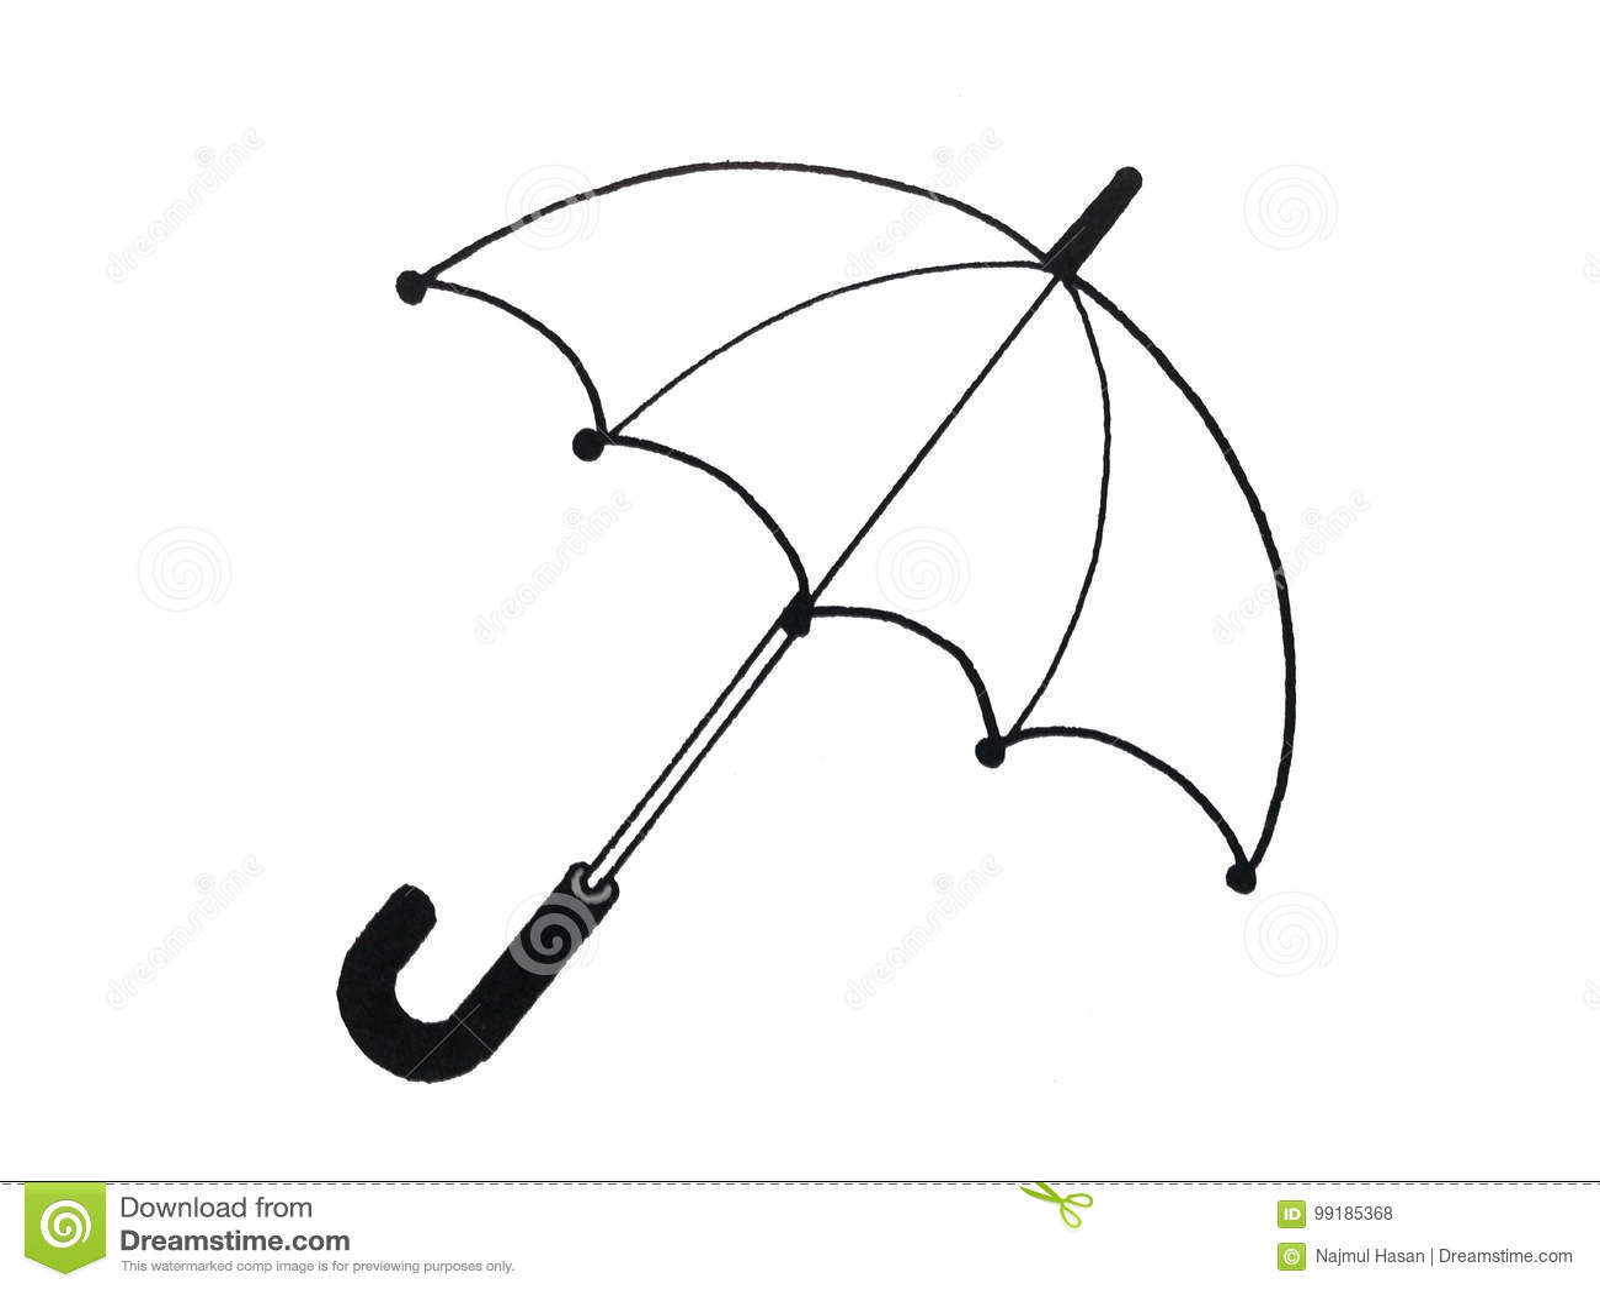 Illustration Of An Umbrella Stock Illustration Illustration Of